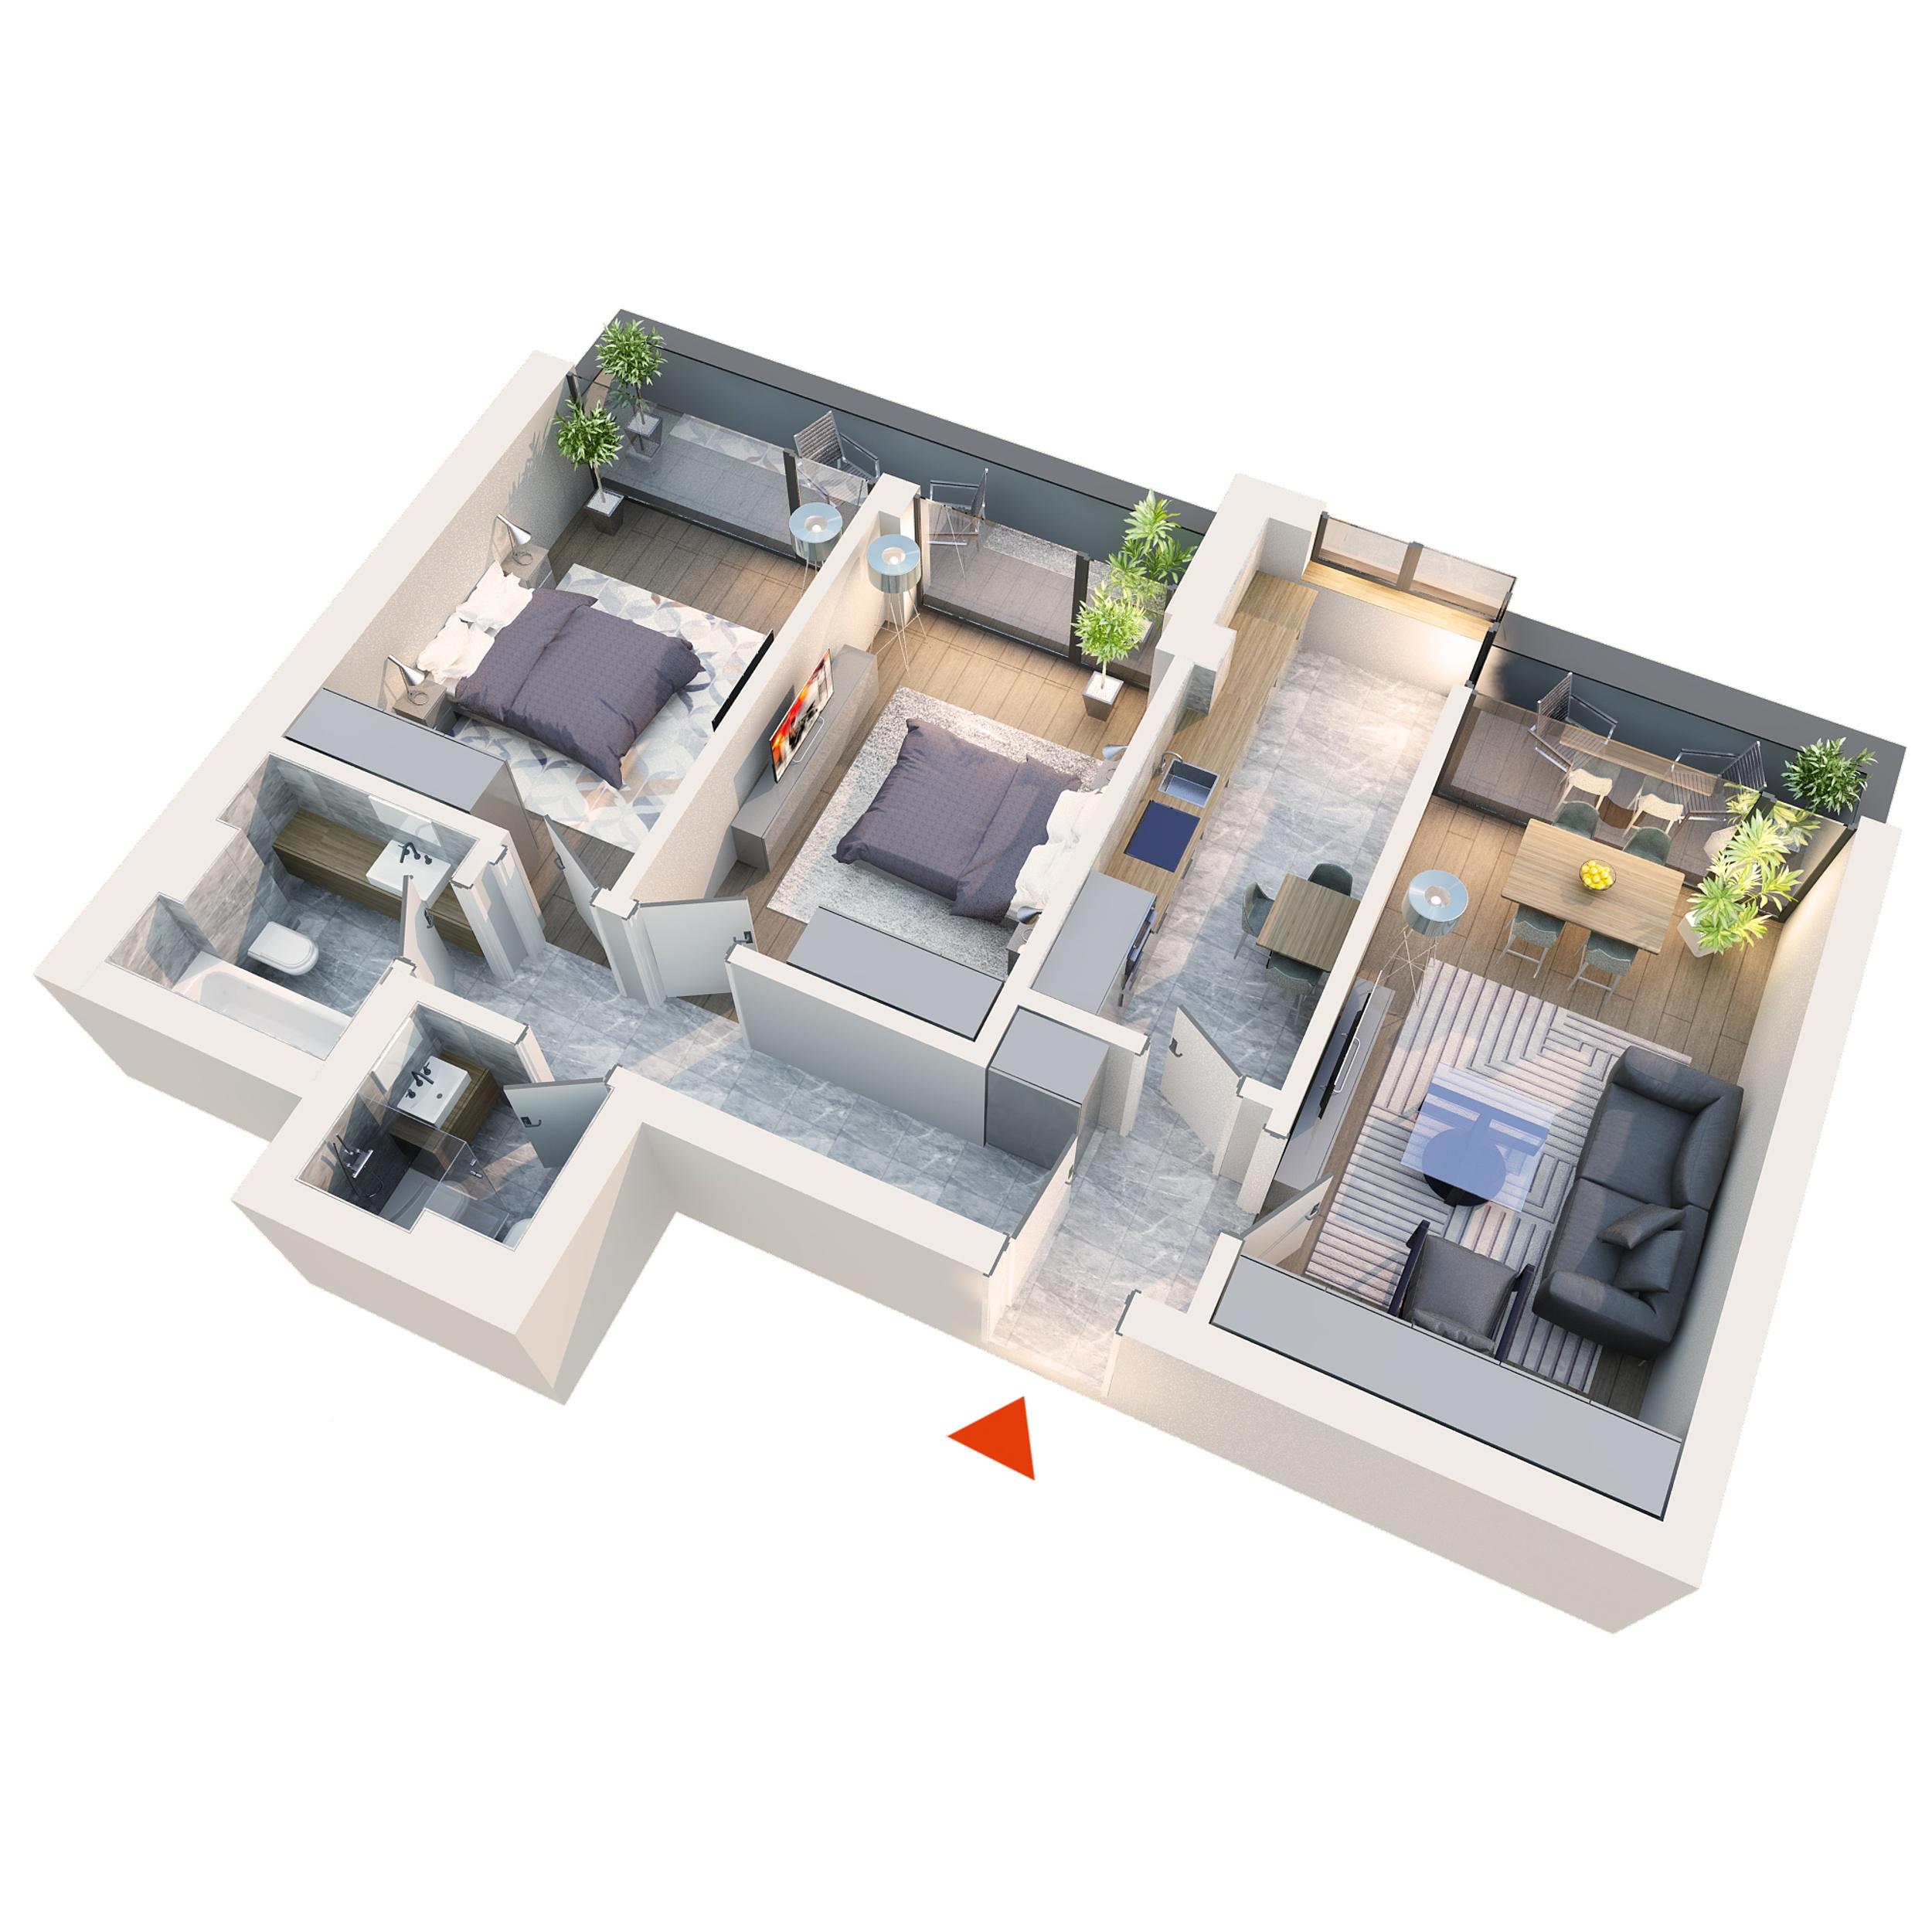 Apartament 3 camere tip 3B3 | 2 Balcoane | Etaj 1 – 3 | Corp C2 C5 | Faza 2